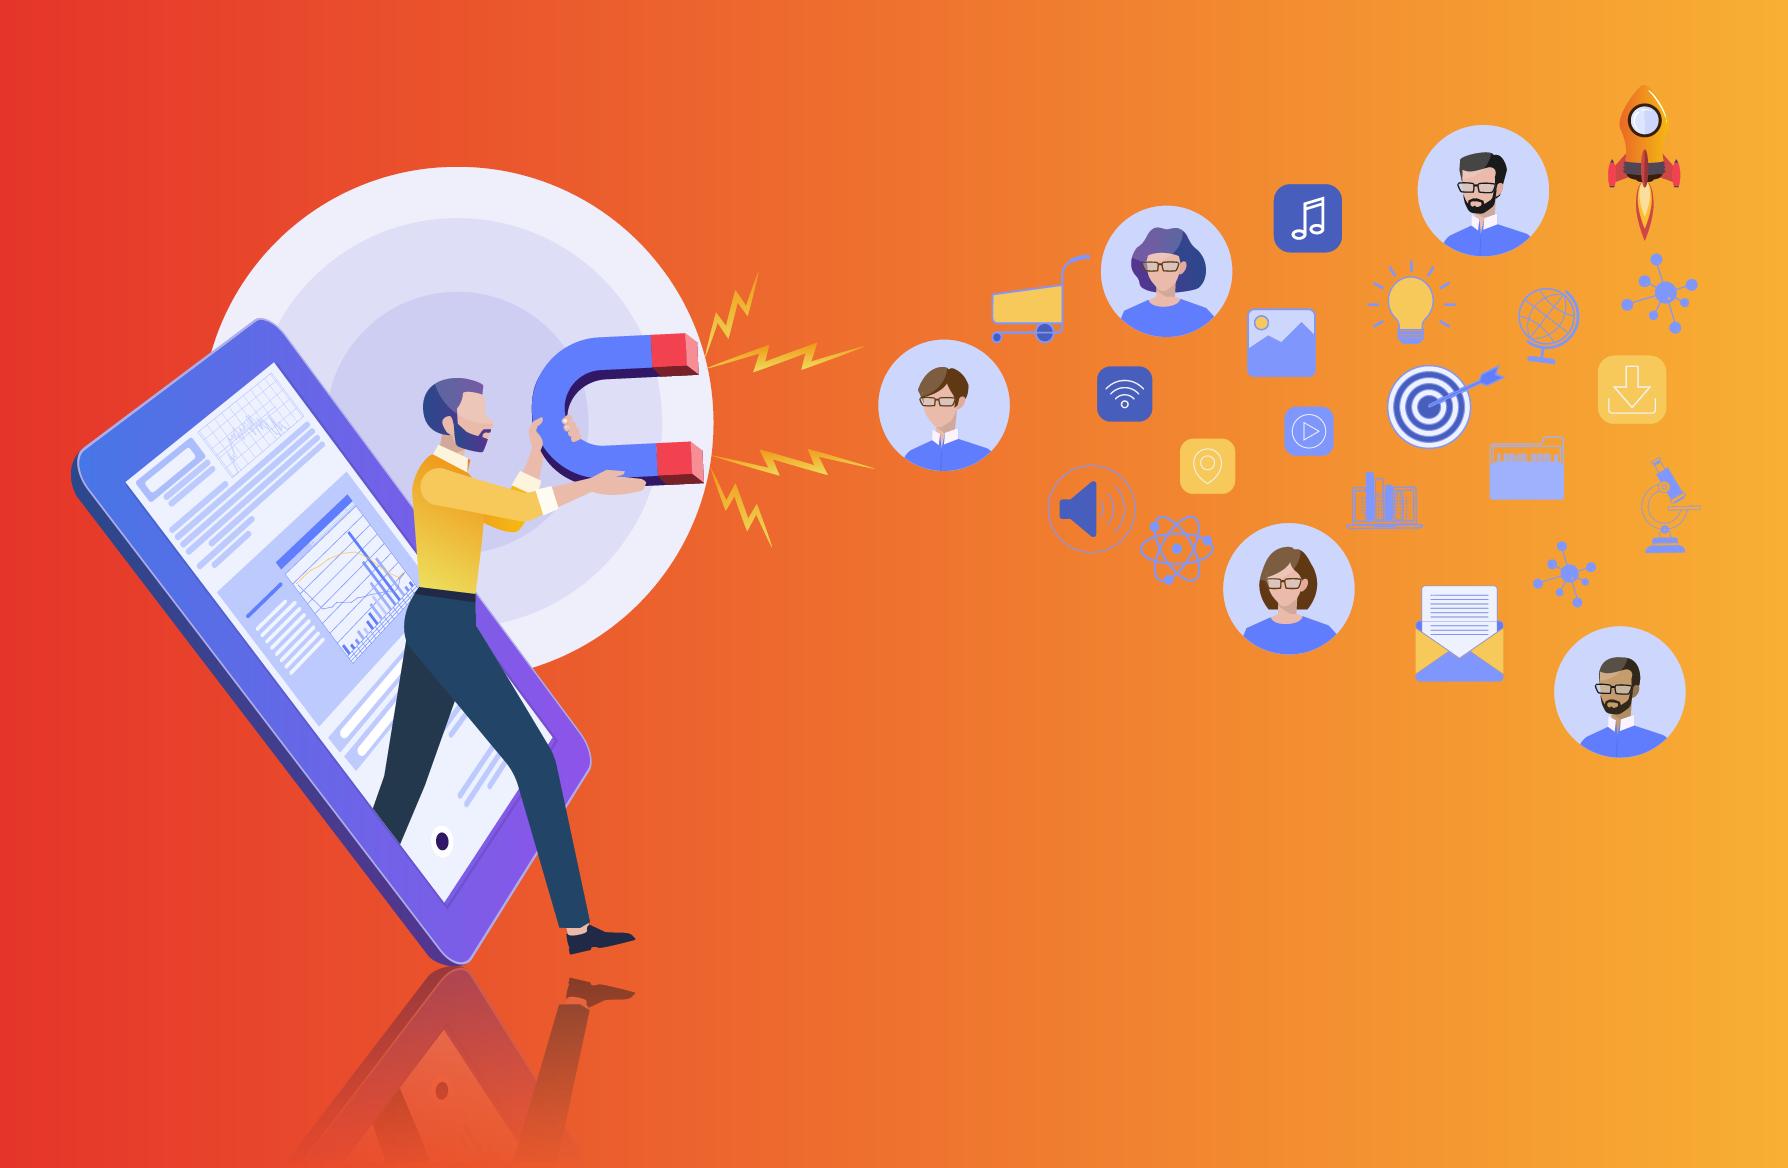 Visuel attirer des prospects qualifiés avec l'inbound marketing